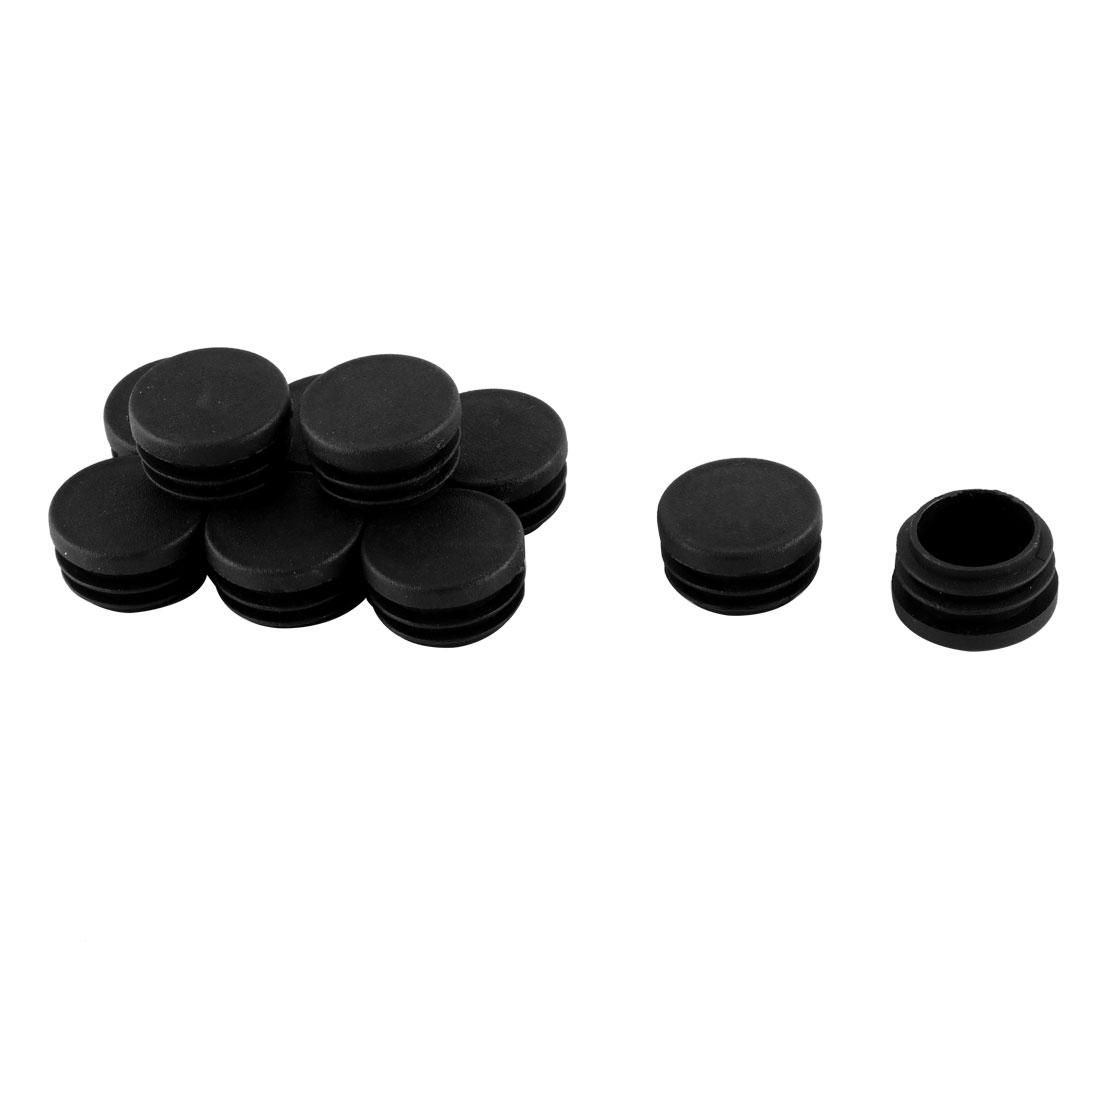 30mm Diameter Round Plastic Blanking End Cap Tubing Tube Insert 10 Pcs